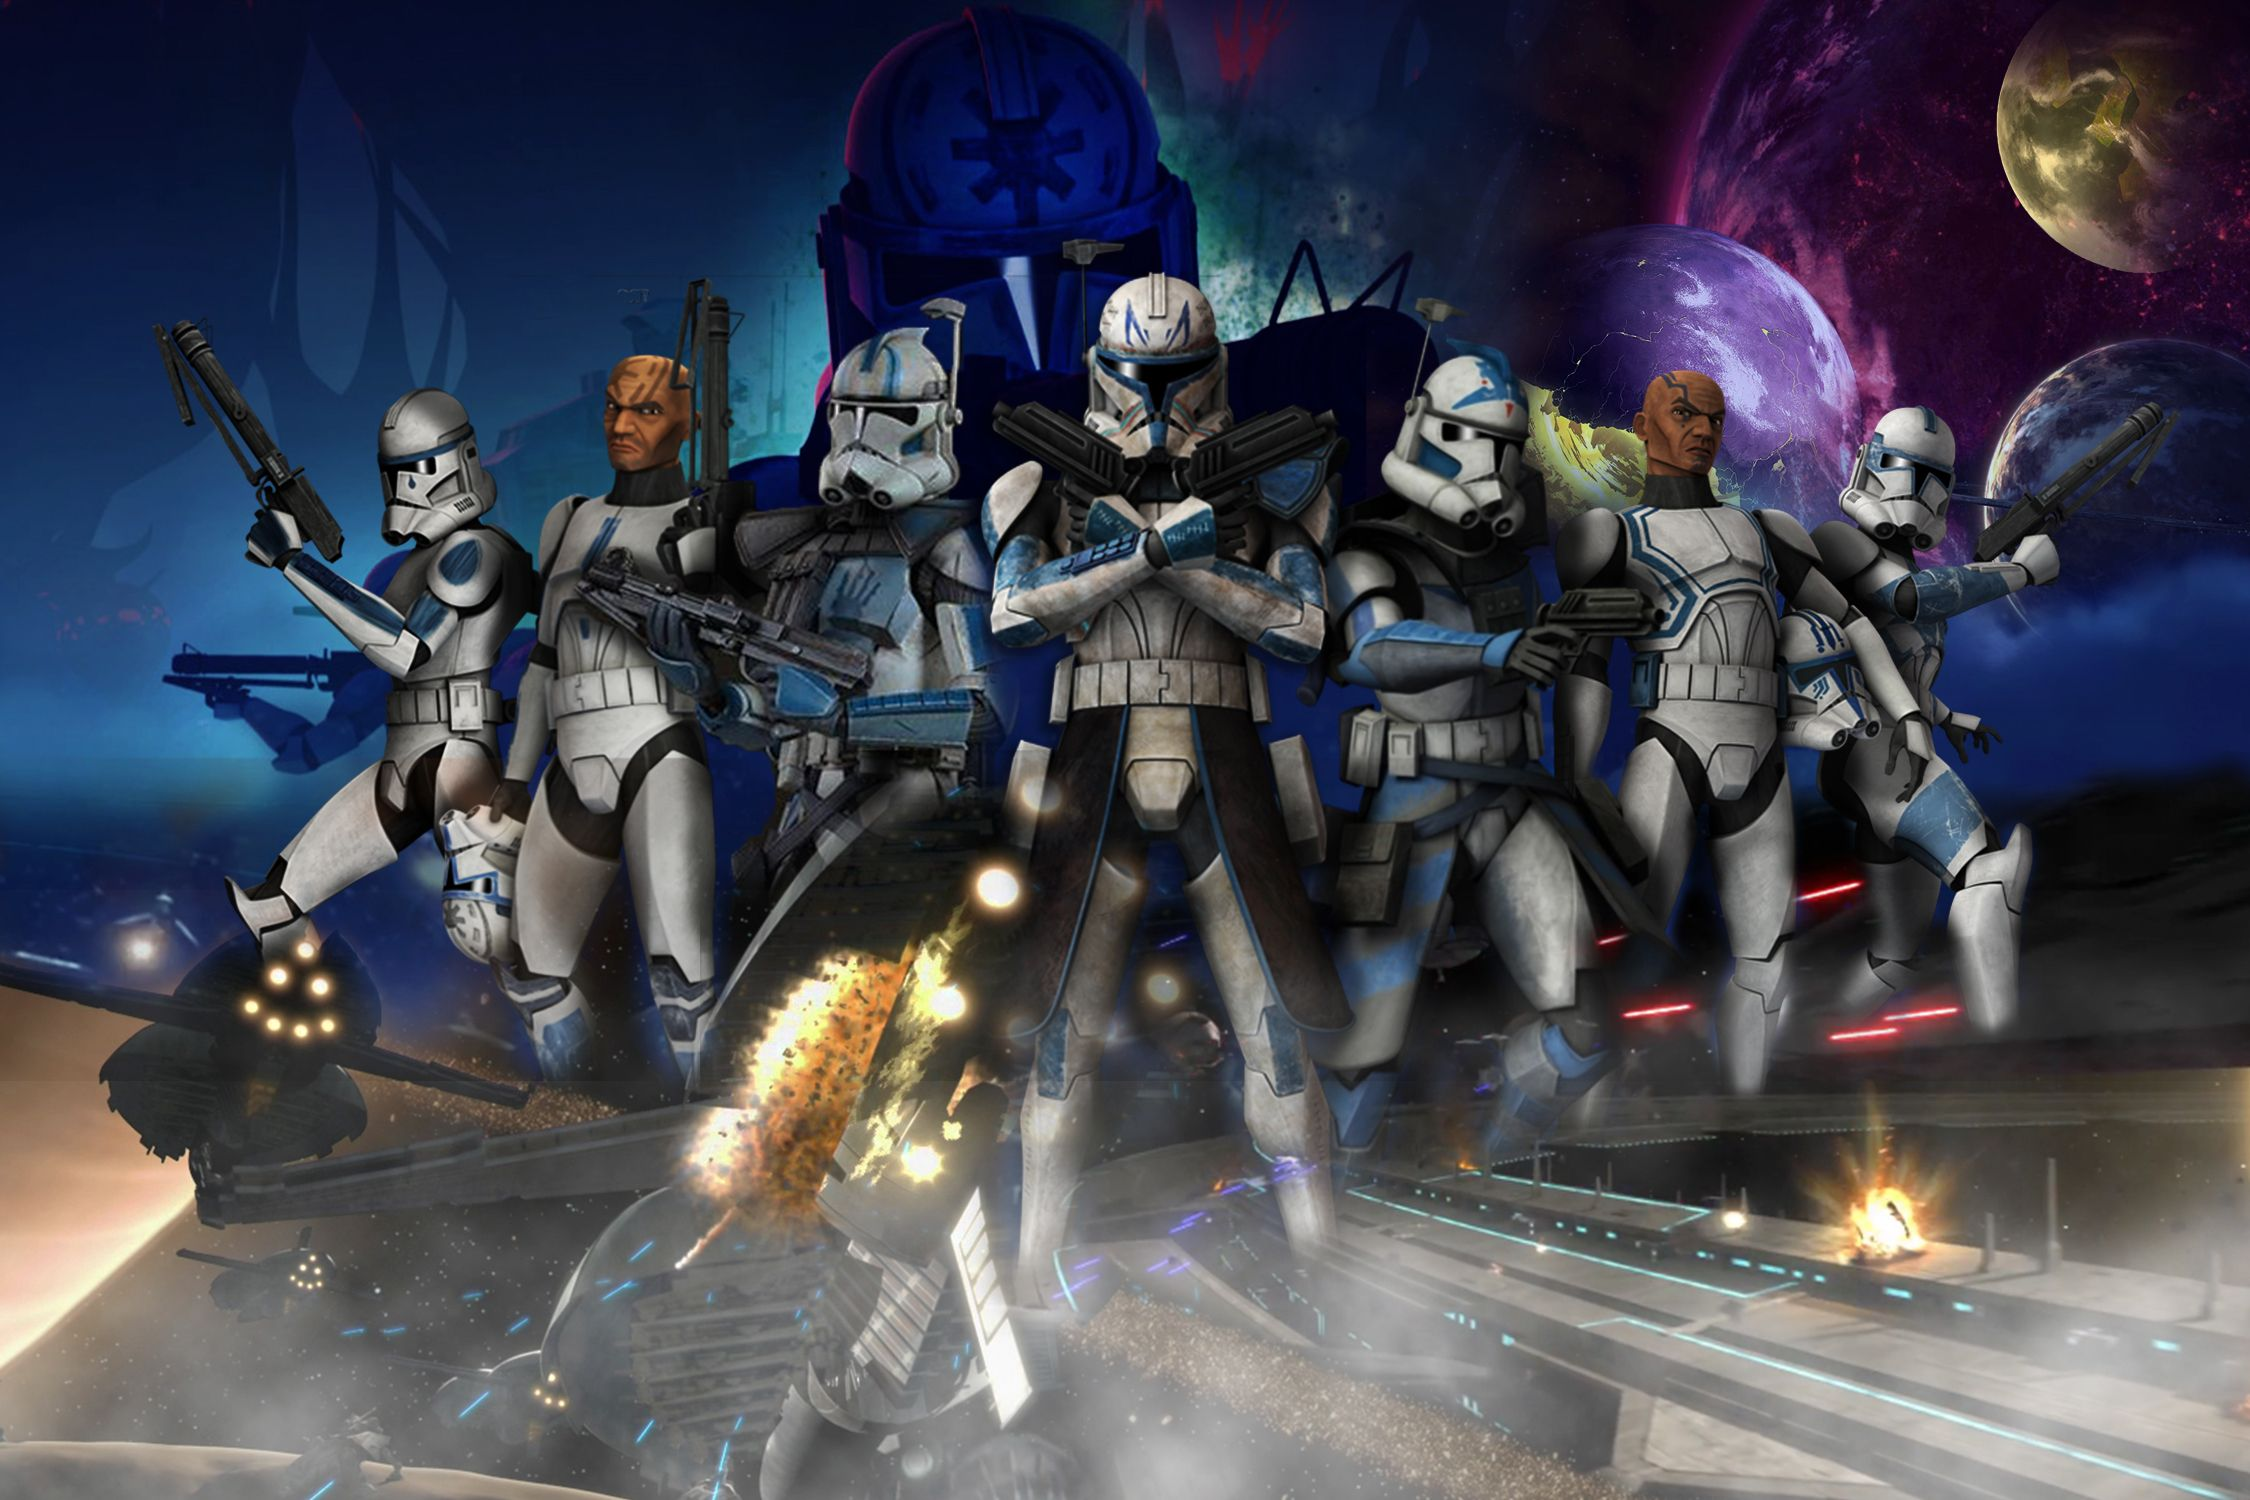 501st Wallpaper In 2020 Wallpaper Star Wars Darth